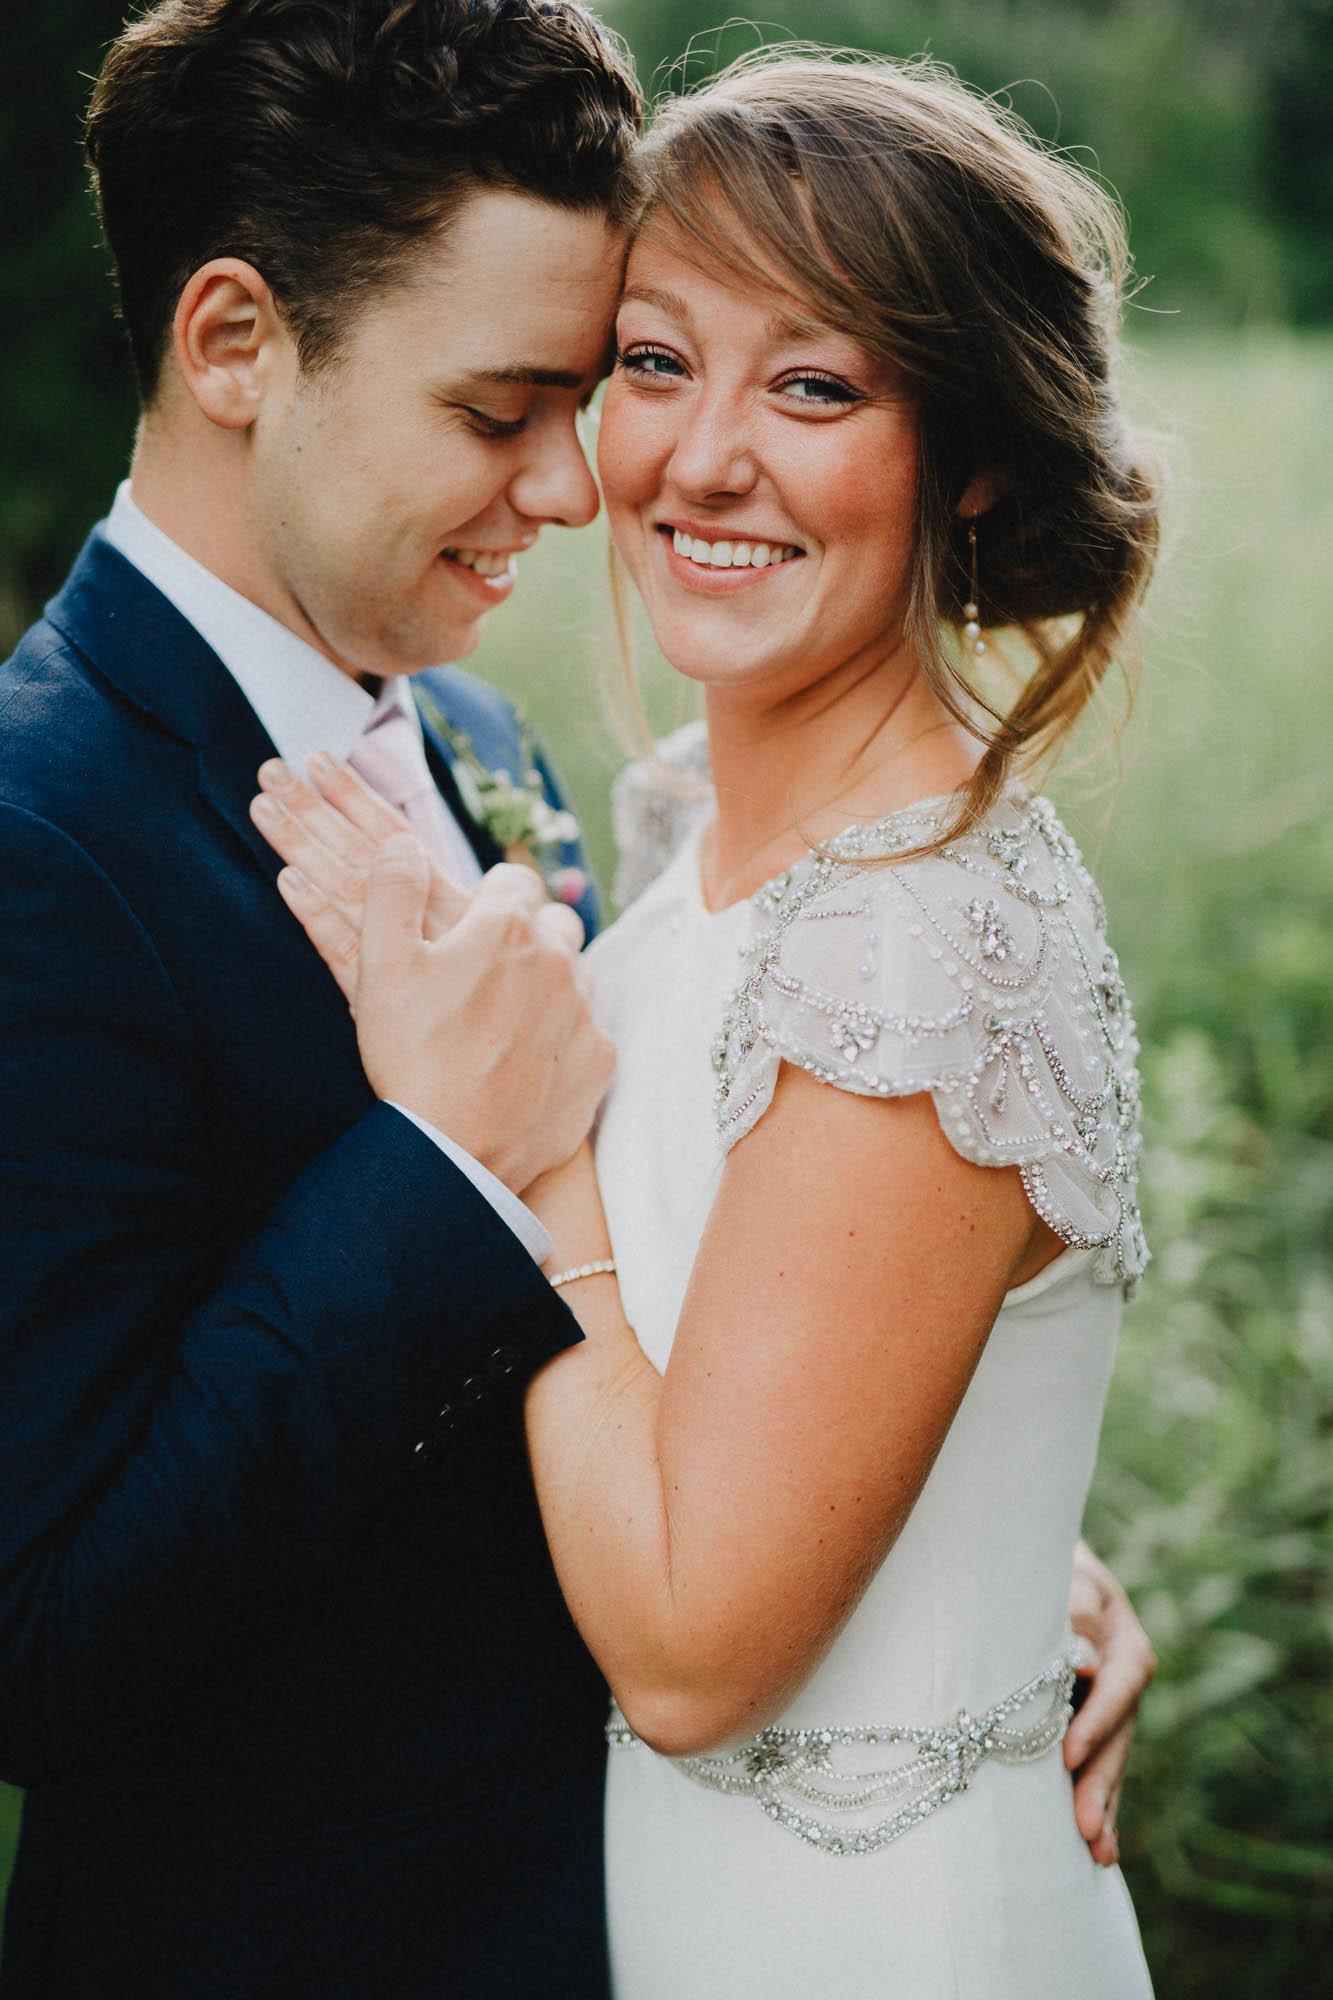 Leah-Graham-Michigan-Outdoor-DIY-Wedding-081@2x.jpg